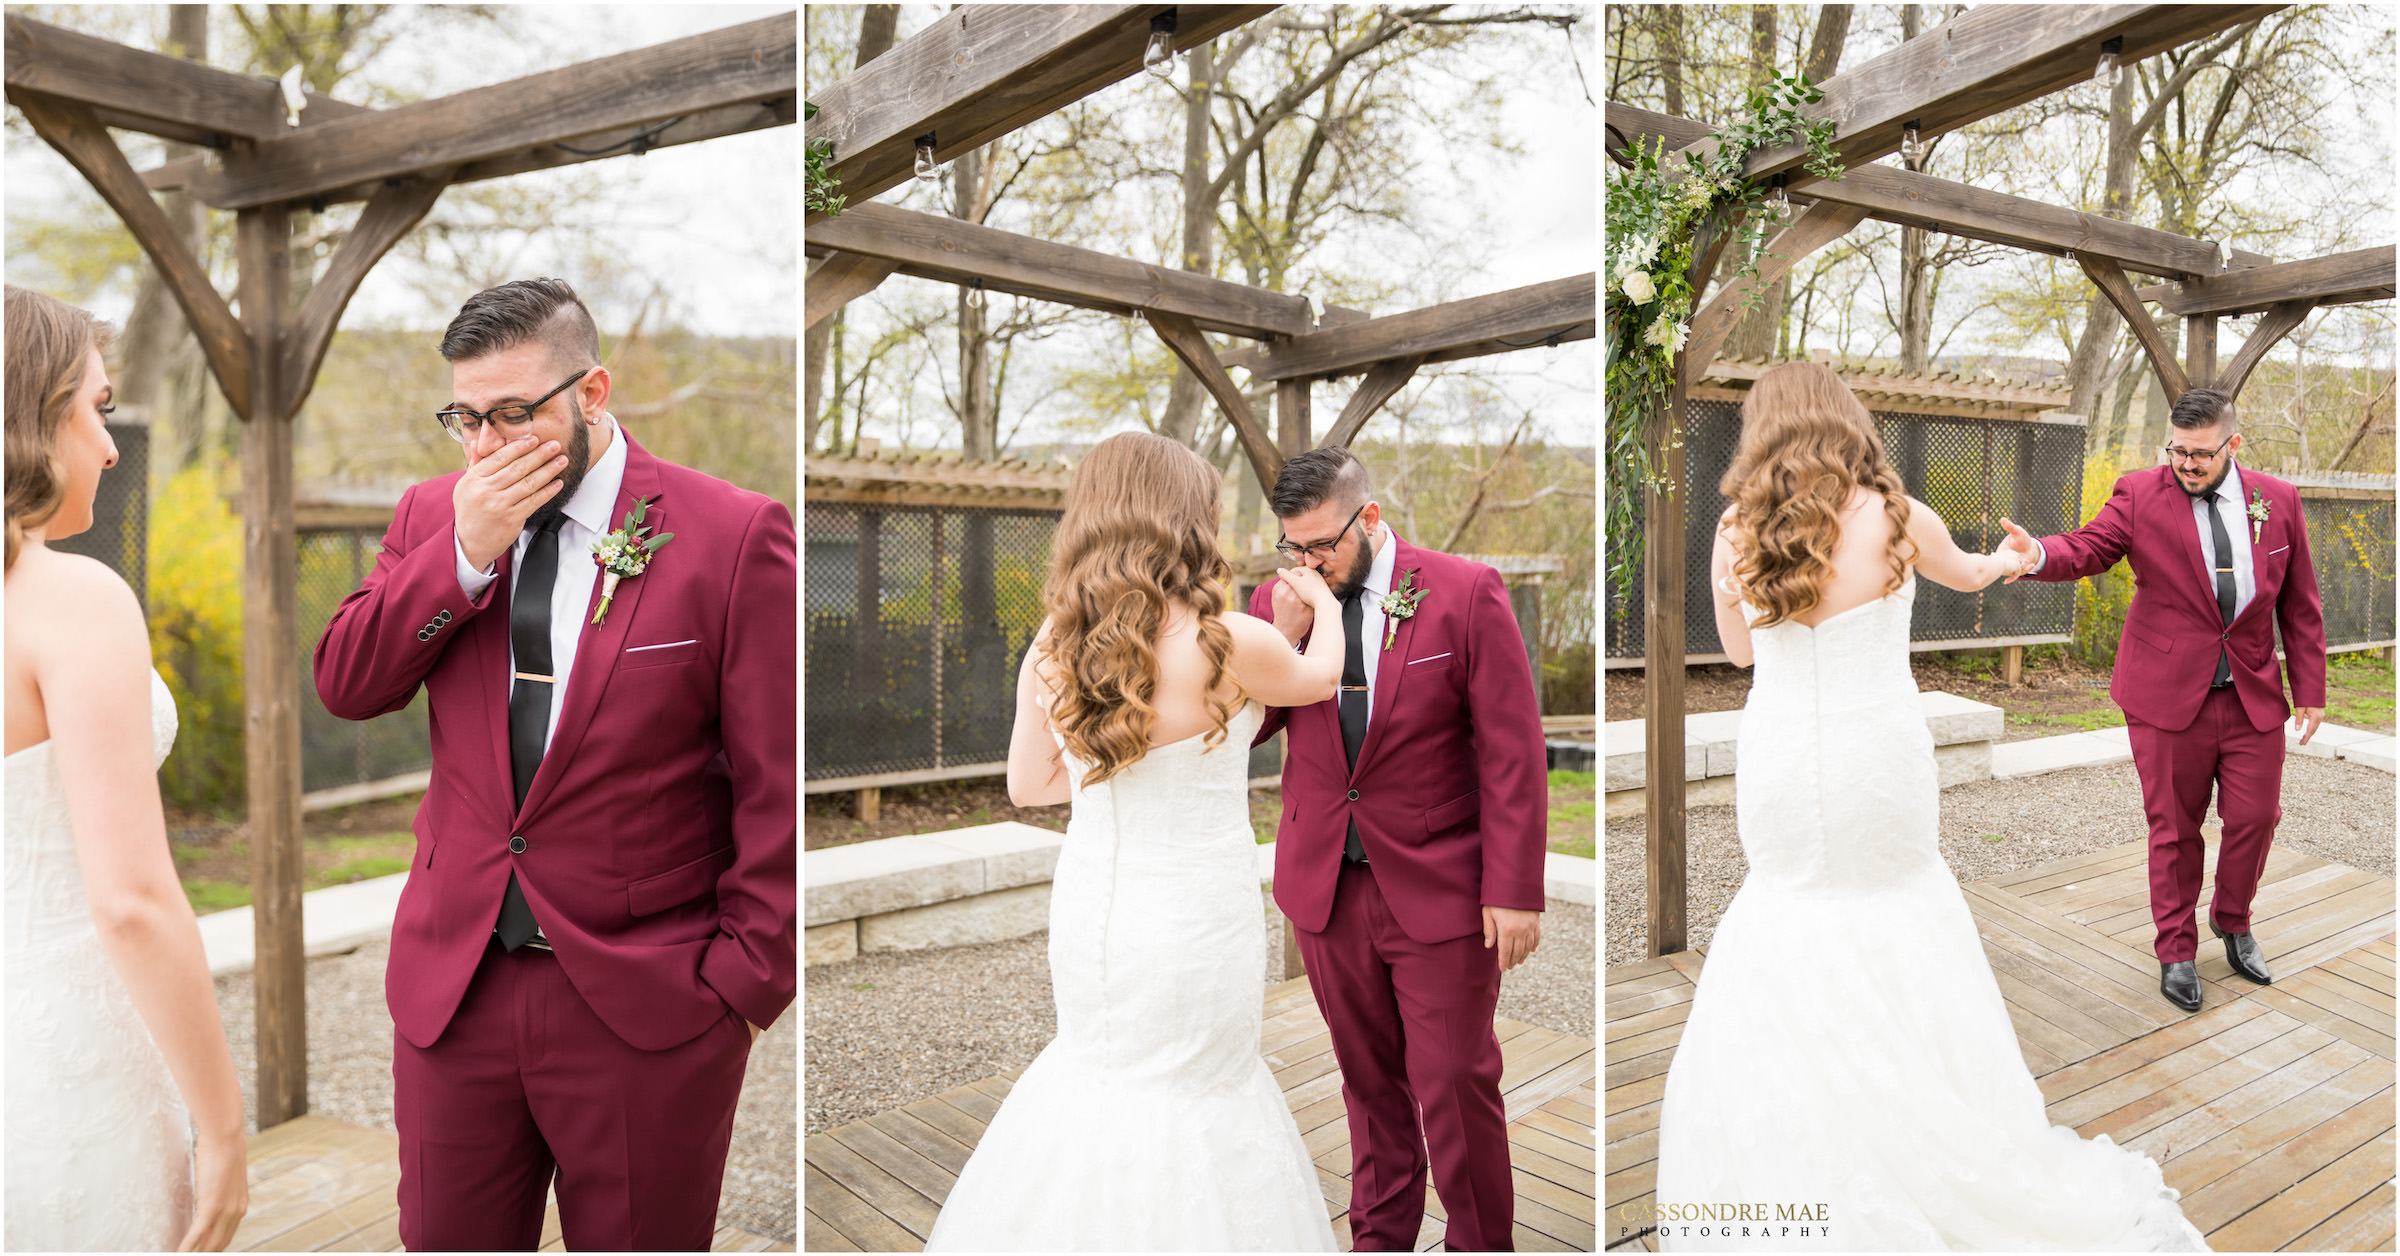 Cassondre Mae Photography Cove Castle Weddings 20.jpg